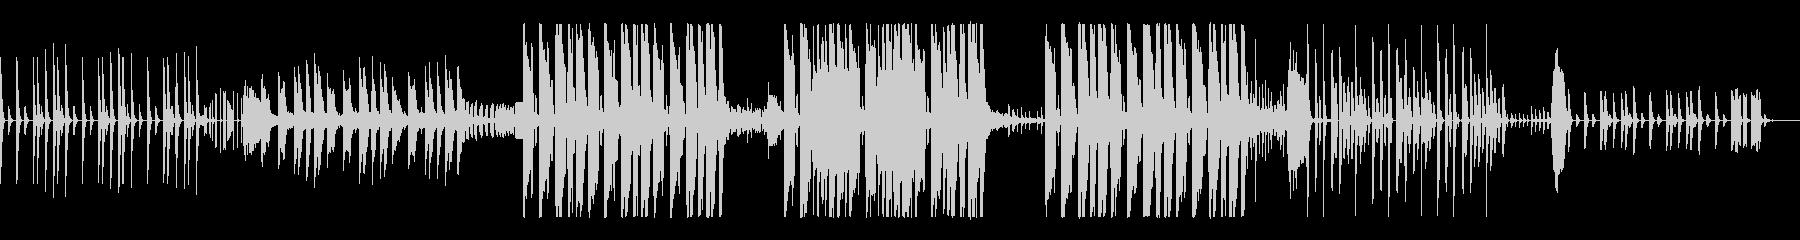 KANTエレクトロヒップなBGMの未再生の波形